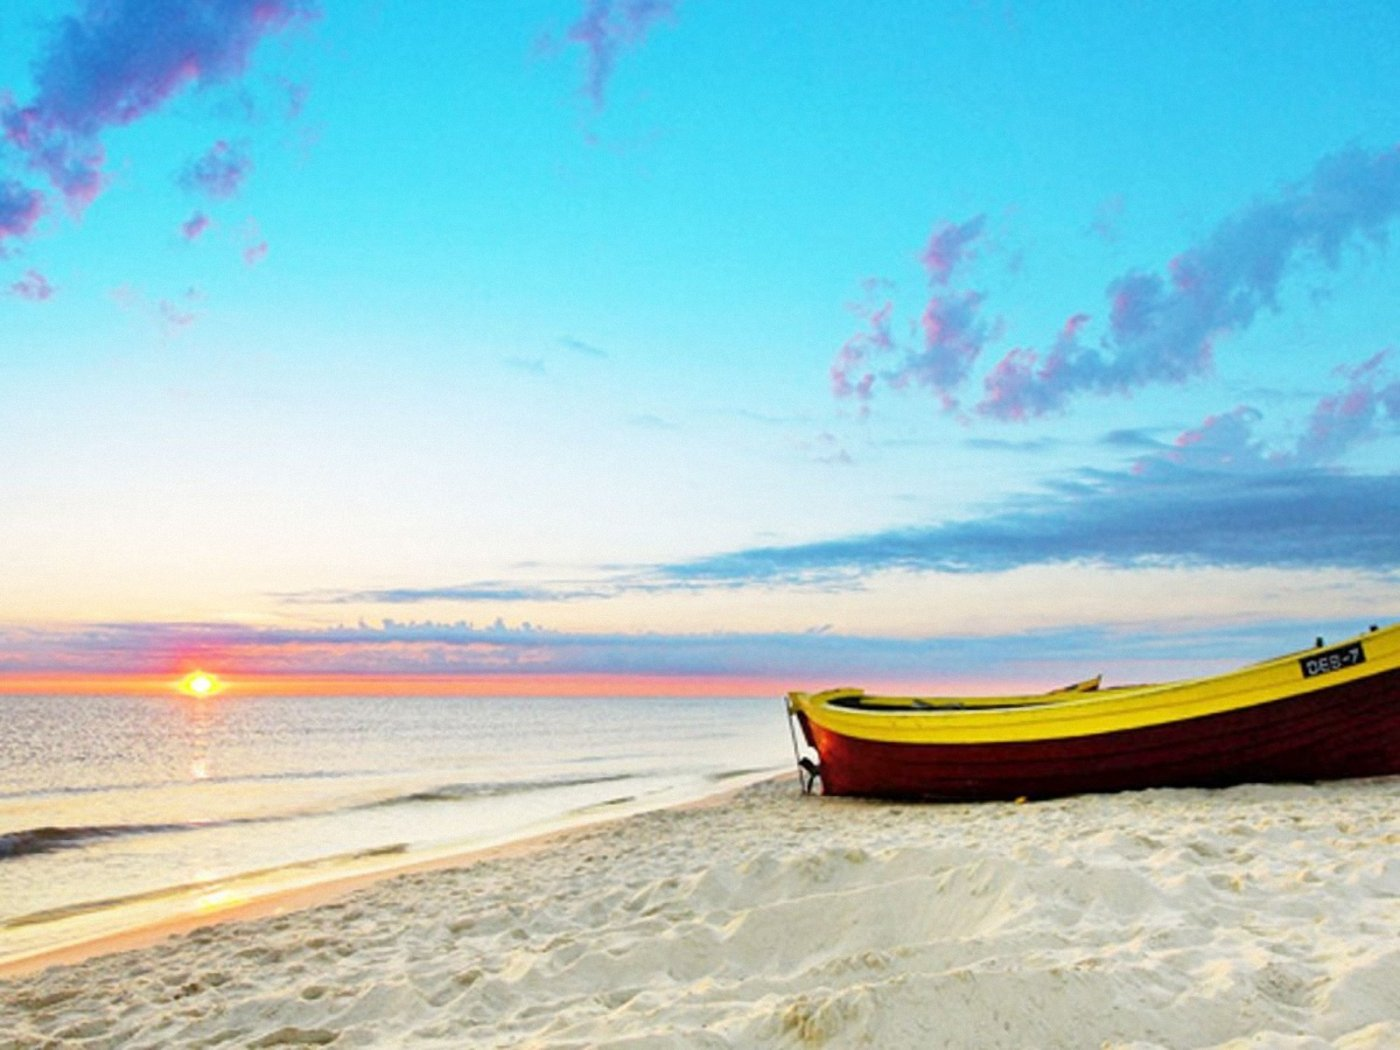 WhereIsCapeCod Cape Cod National Seashore 1400x1050 1400x1050